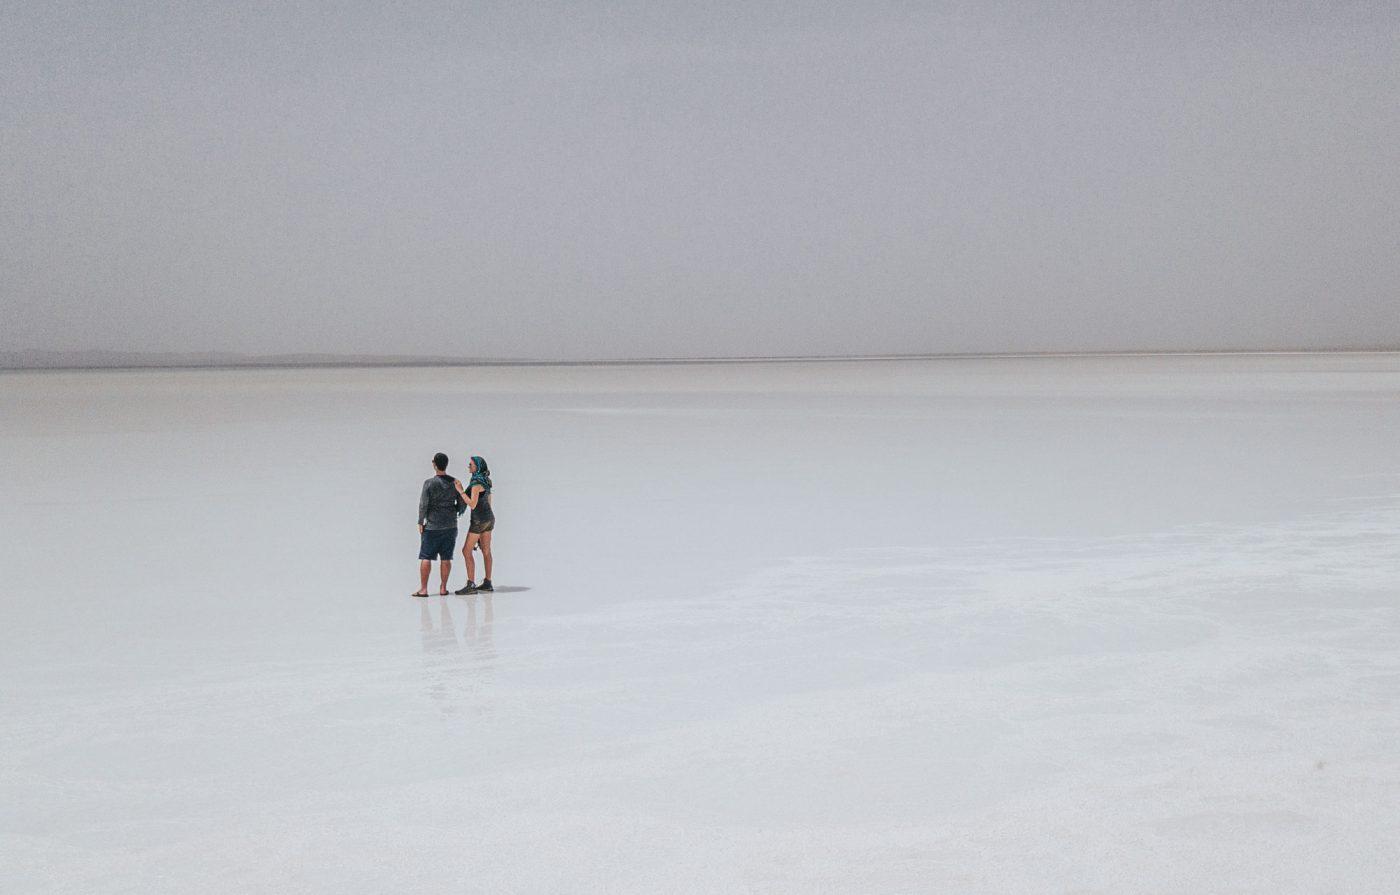 Lake Asale, Dallol, Danakil Depression Day trip